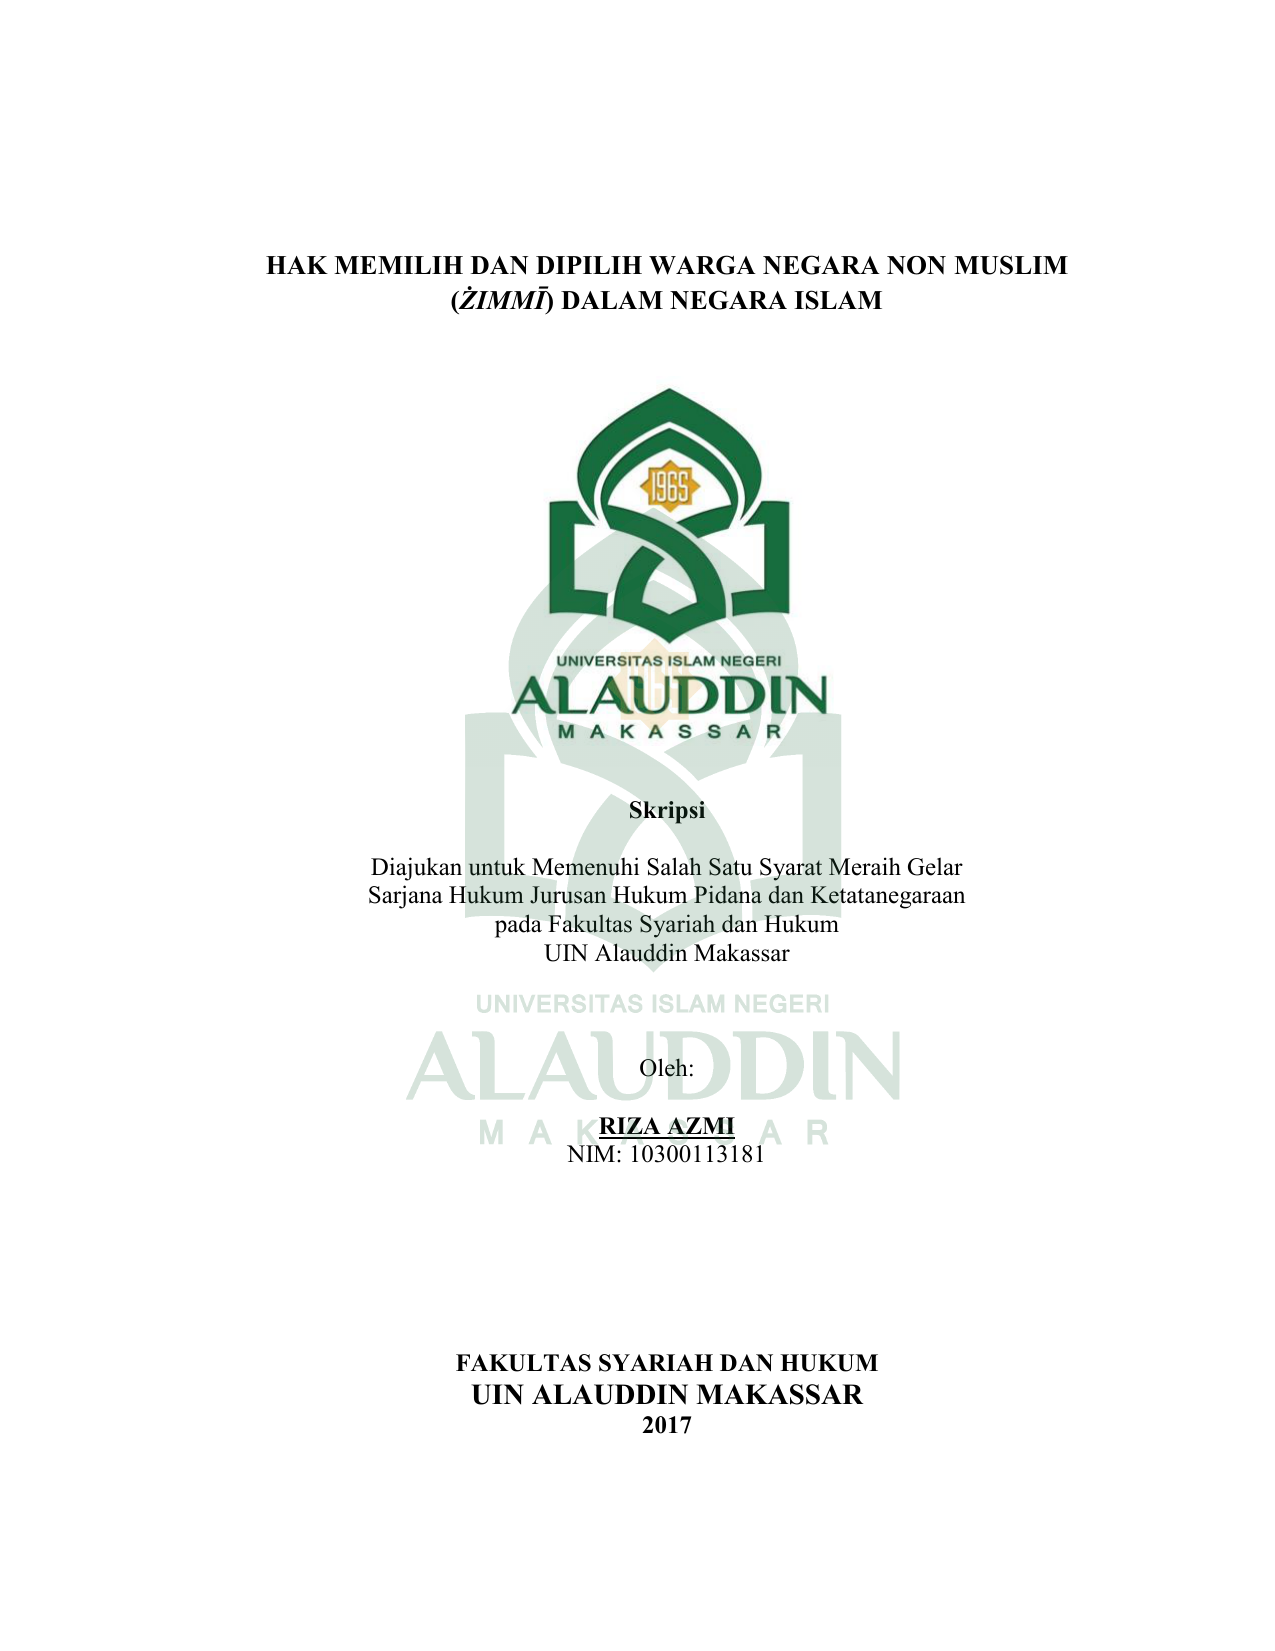 Skripsi Hukum Tata Negara Uin Alauddin